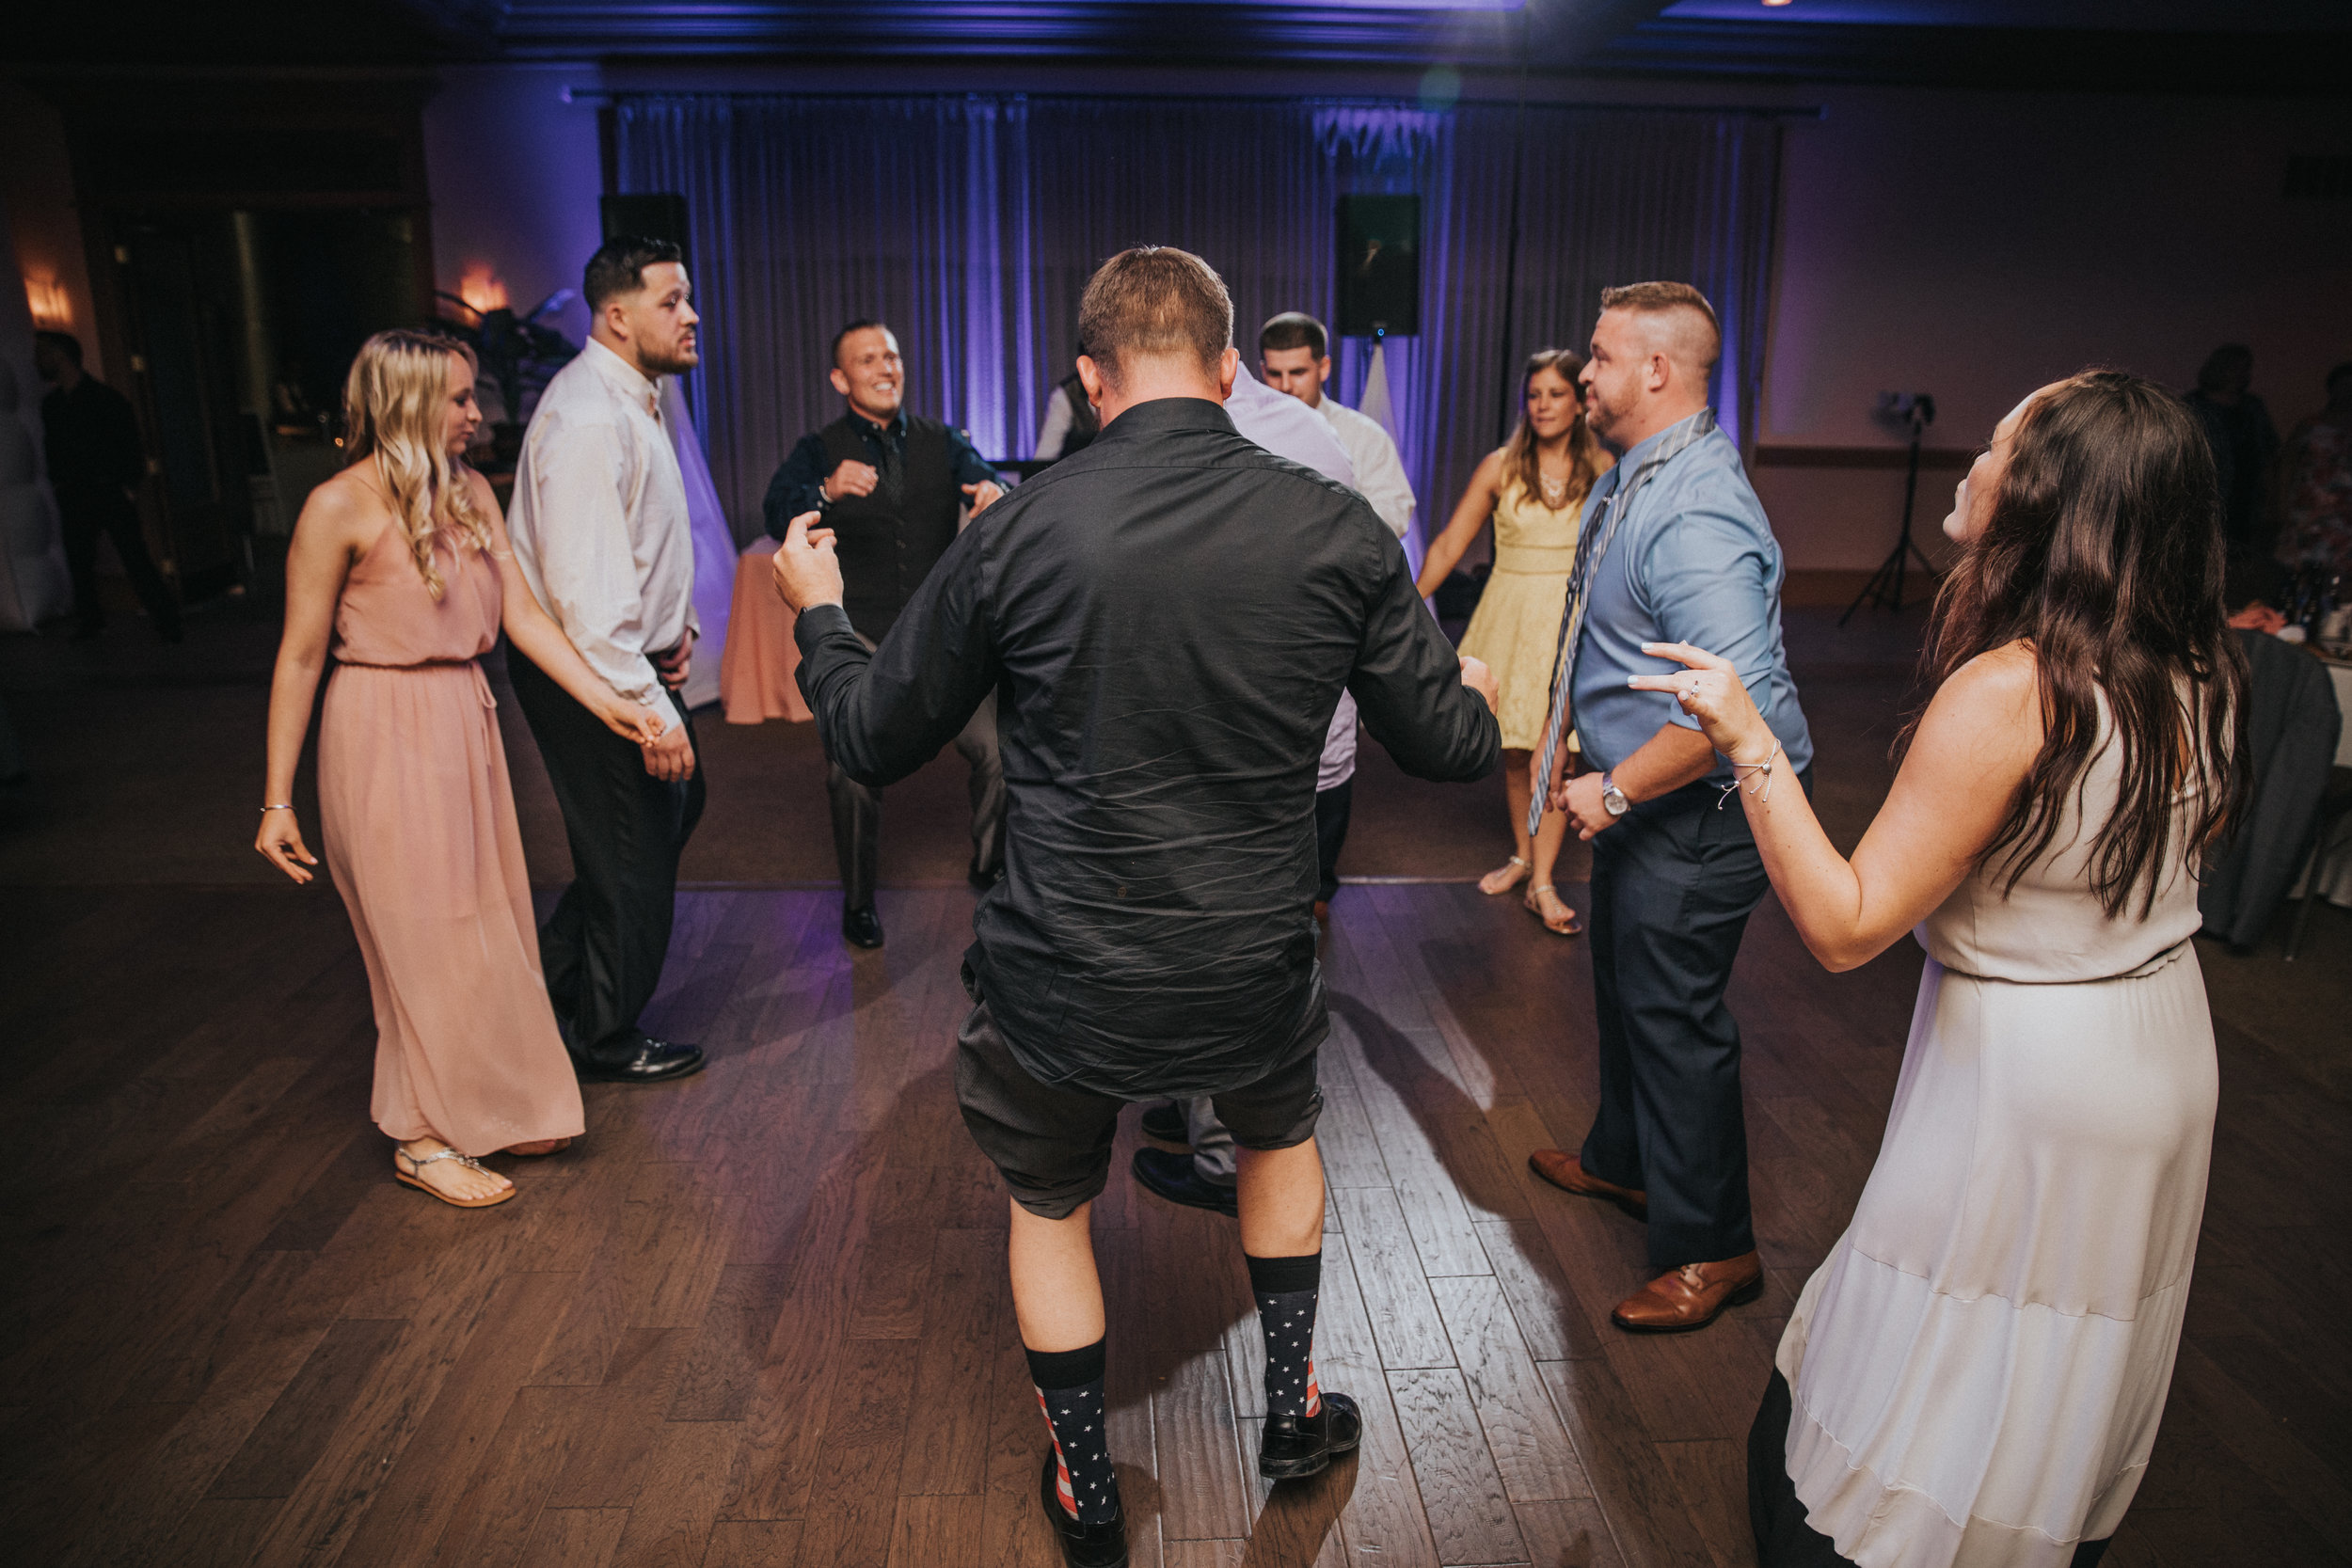 New-Jersey-Wedding-Photographer-JennaLynnPhotography-ValenzanoWinery-Reception-177.jpg